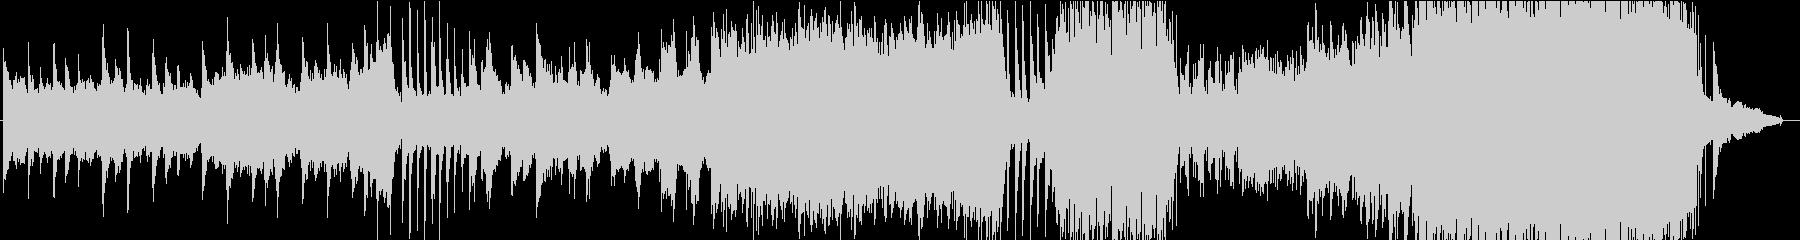 Akegureの未再生の波形